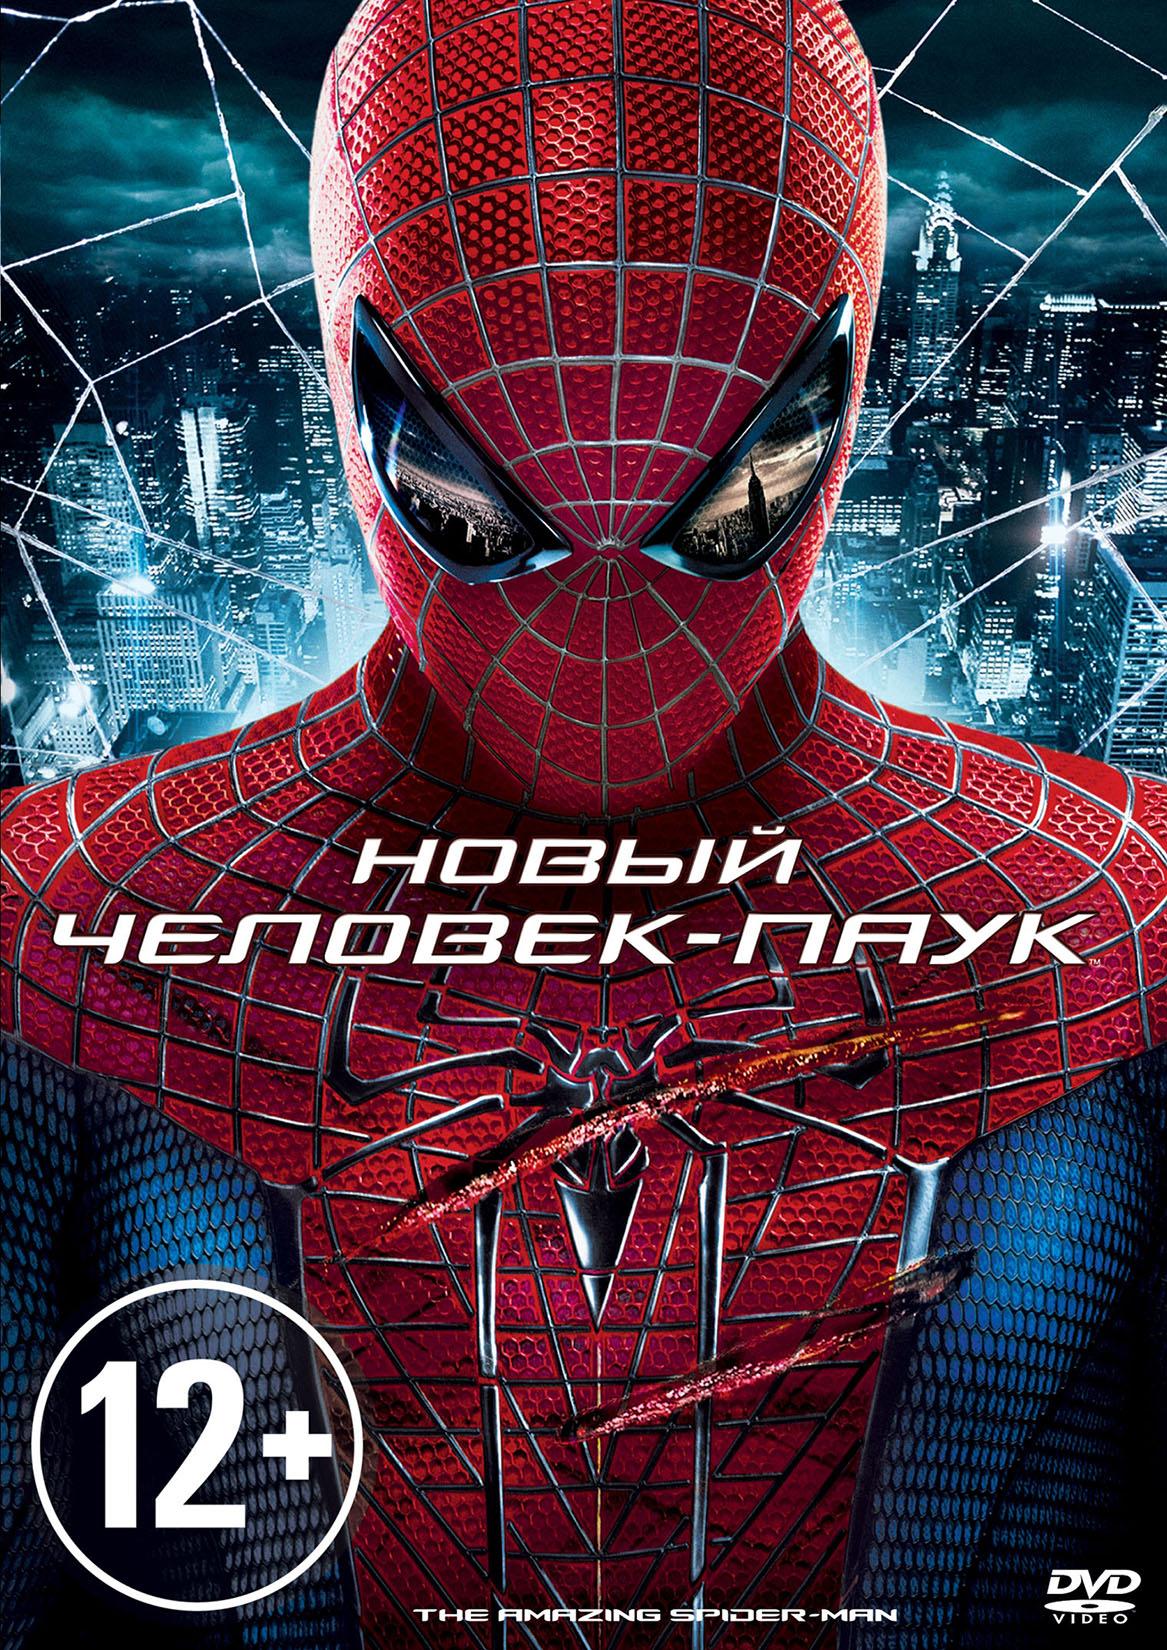 человек паук 8 игры онлайн бесплатно